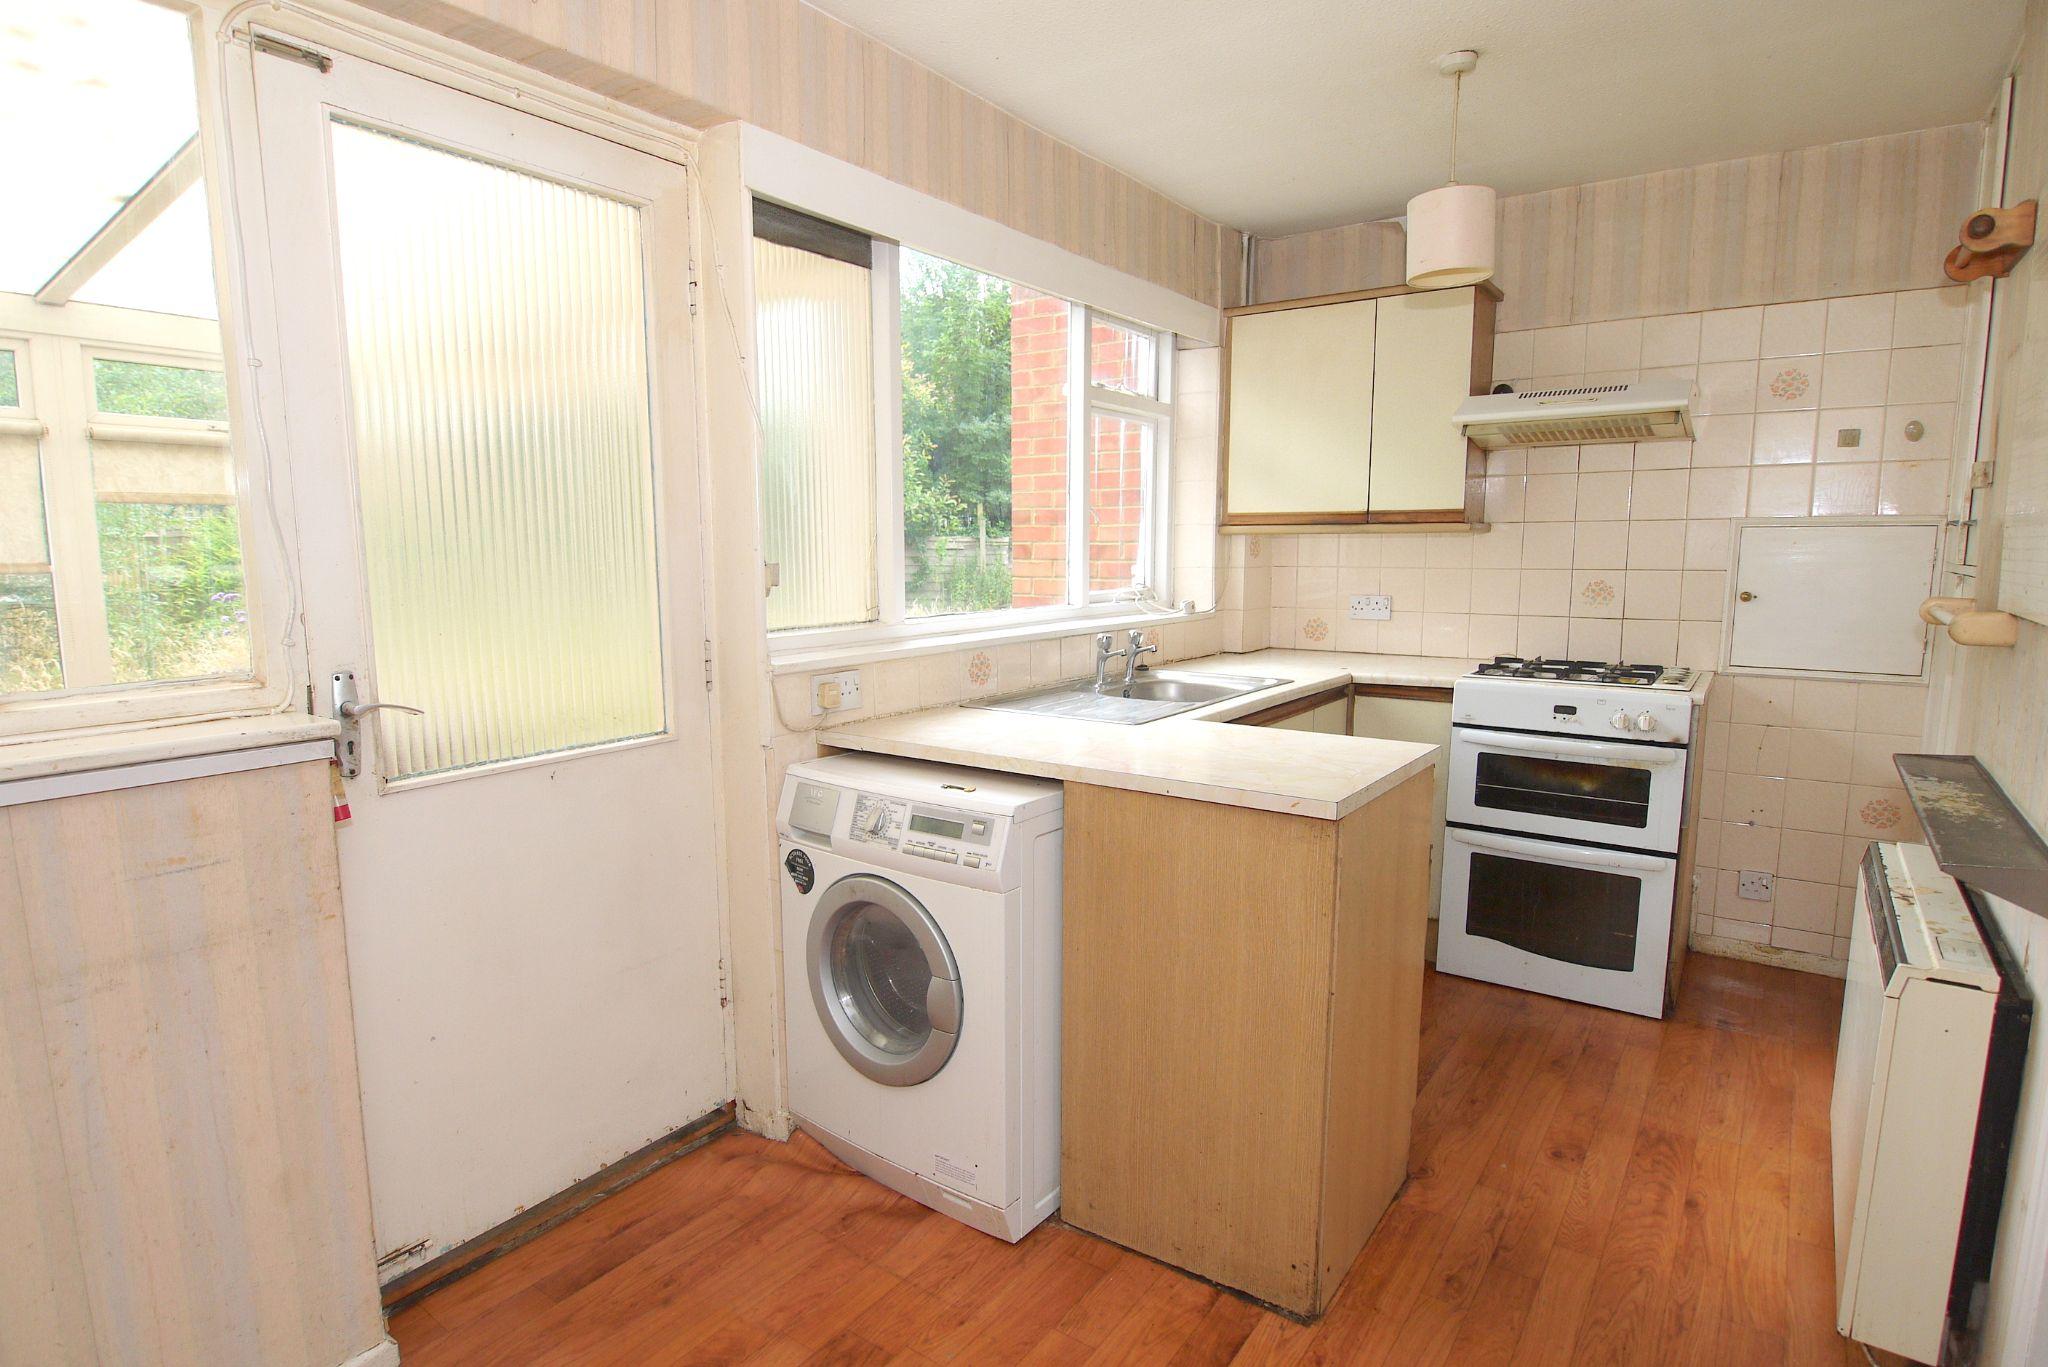 5 bedroom semi-detached house Sold in Sevenoaks - Photograph 4